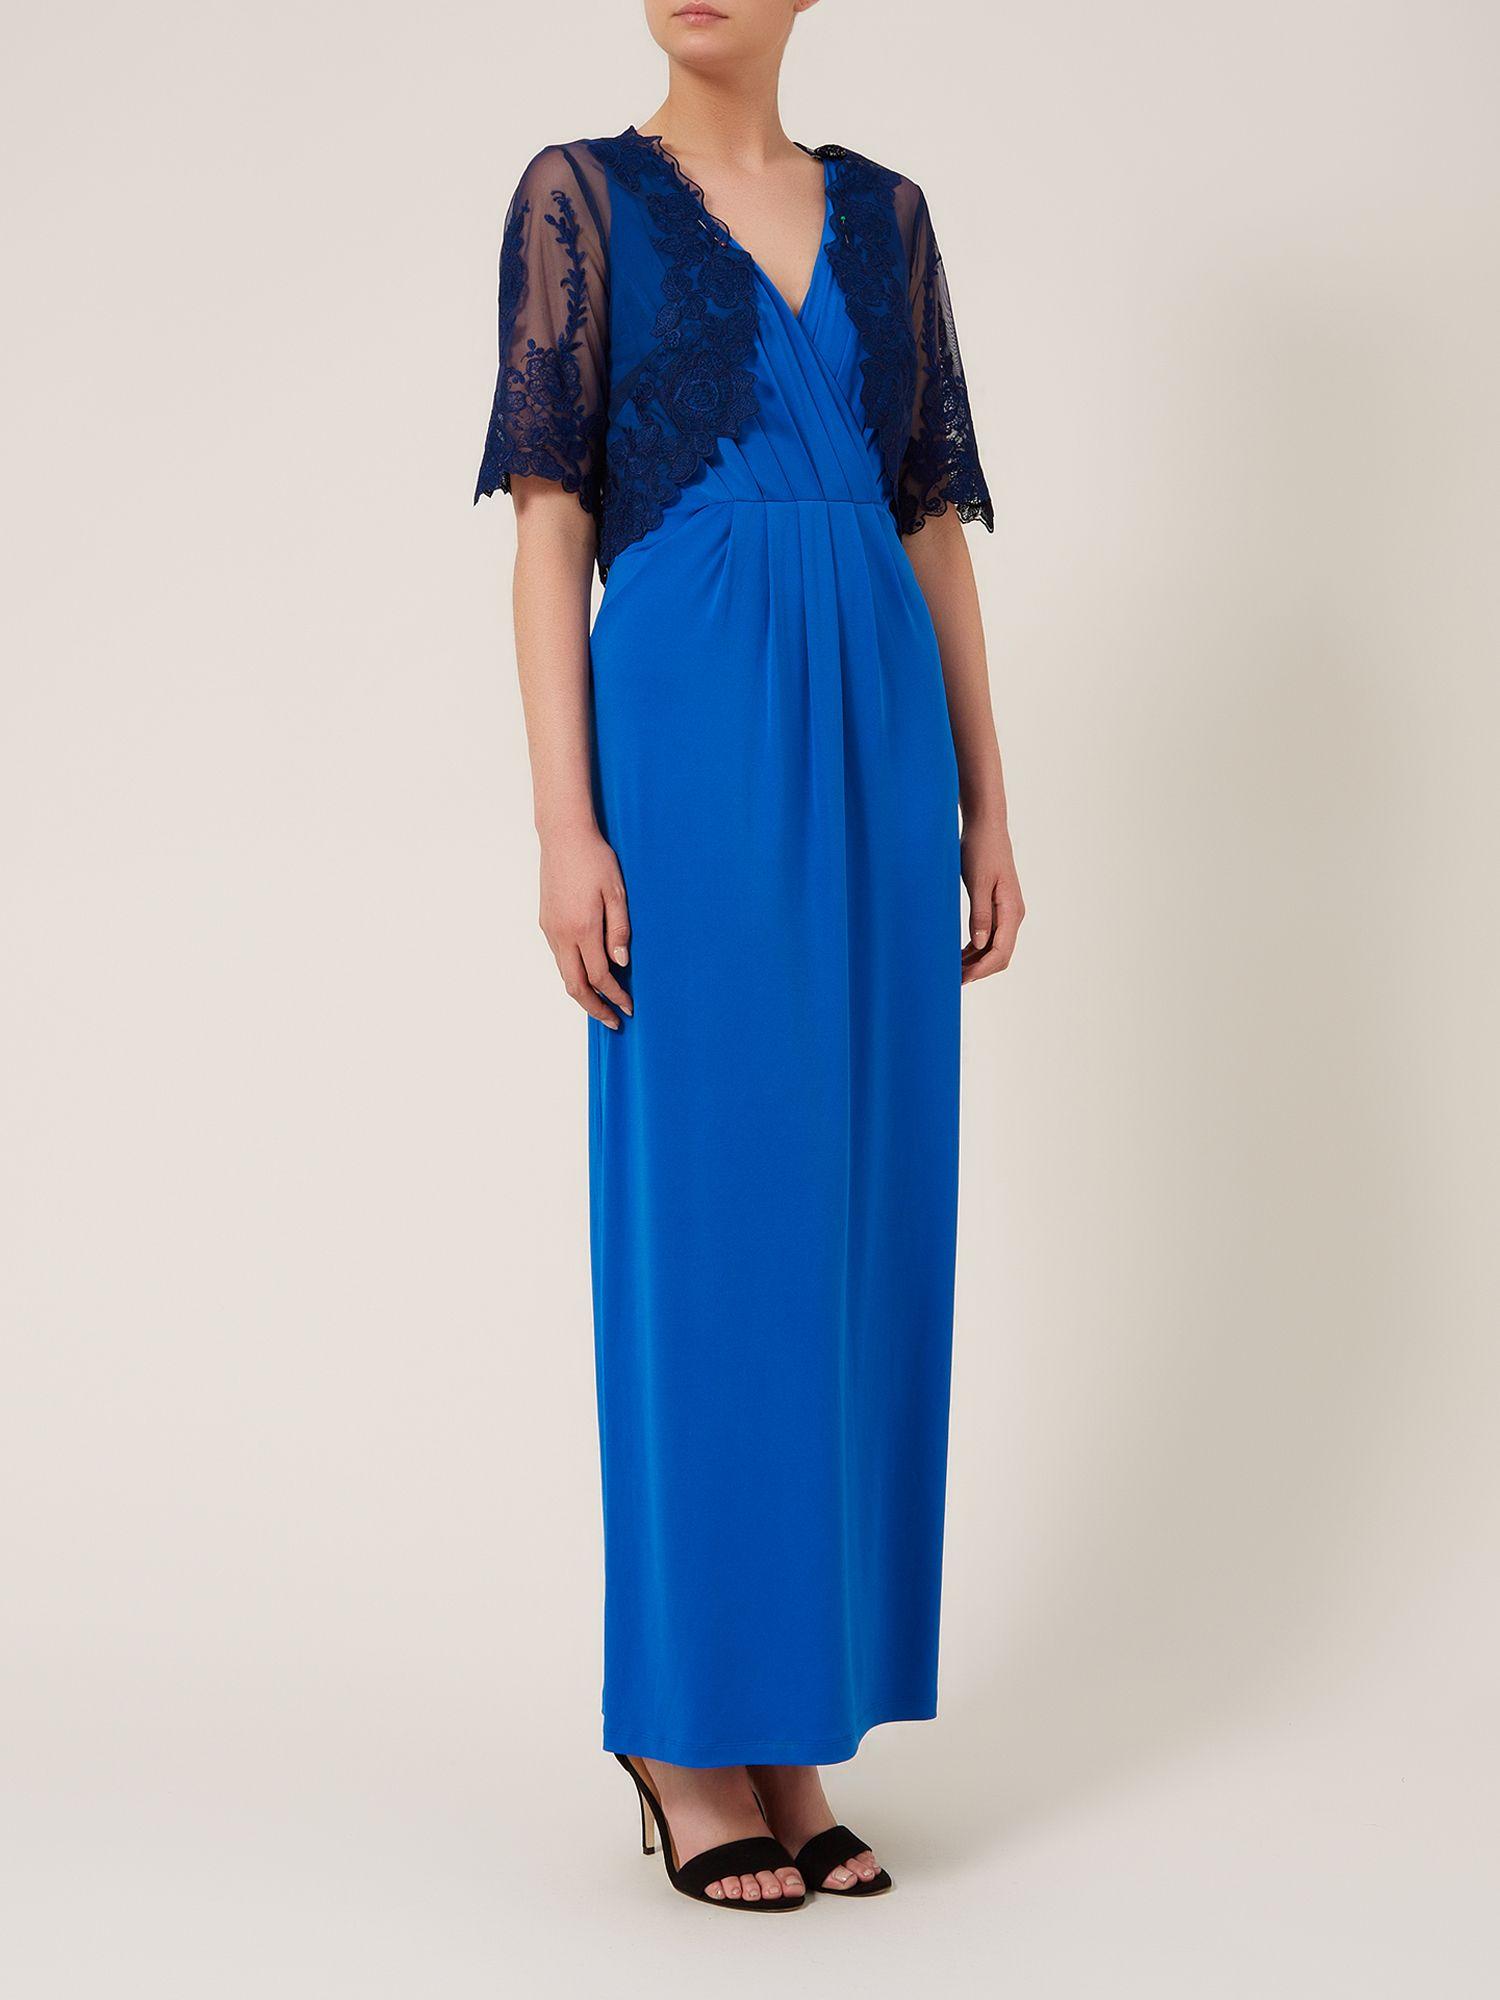 Alexon Maxi Lace Trim Jersey Dress with Lace Bolero in ...